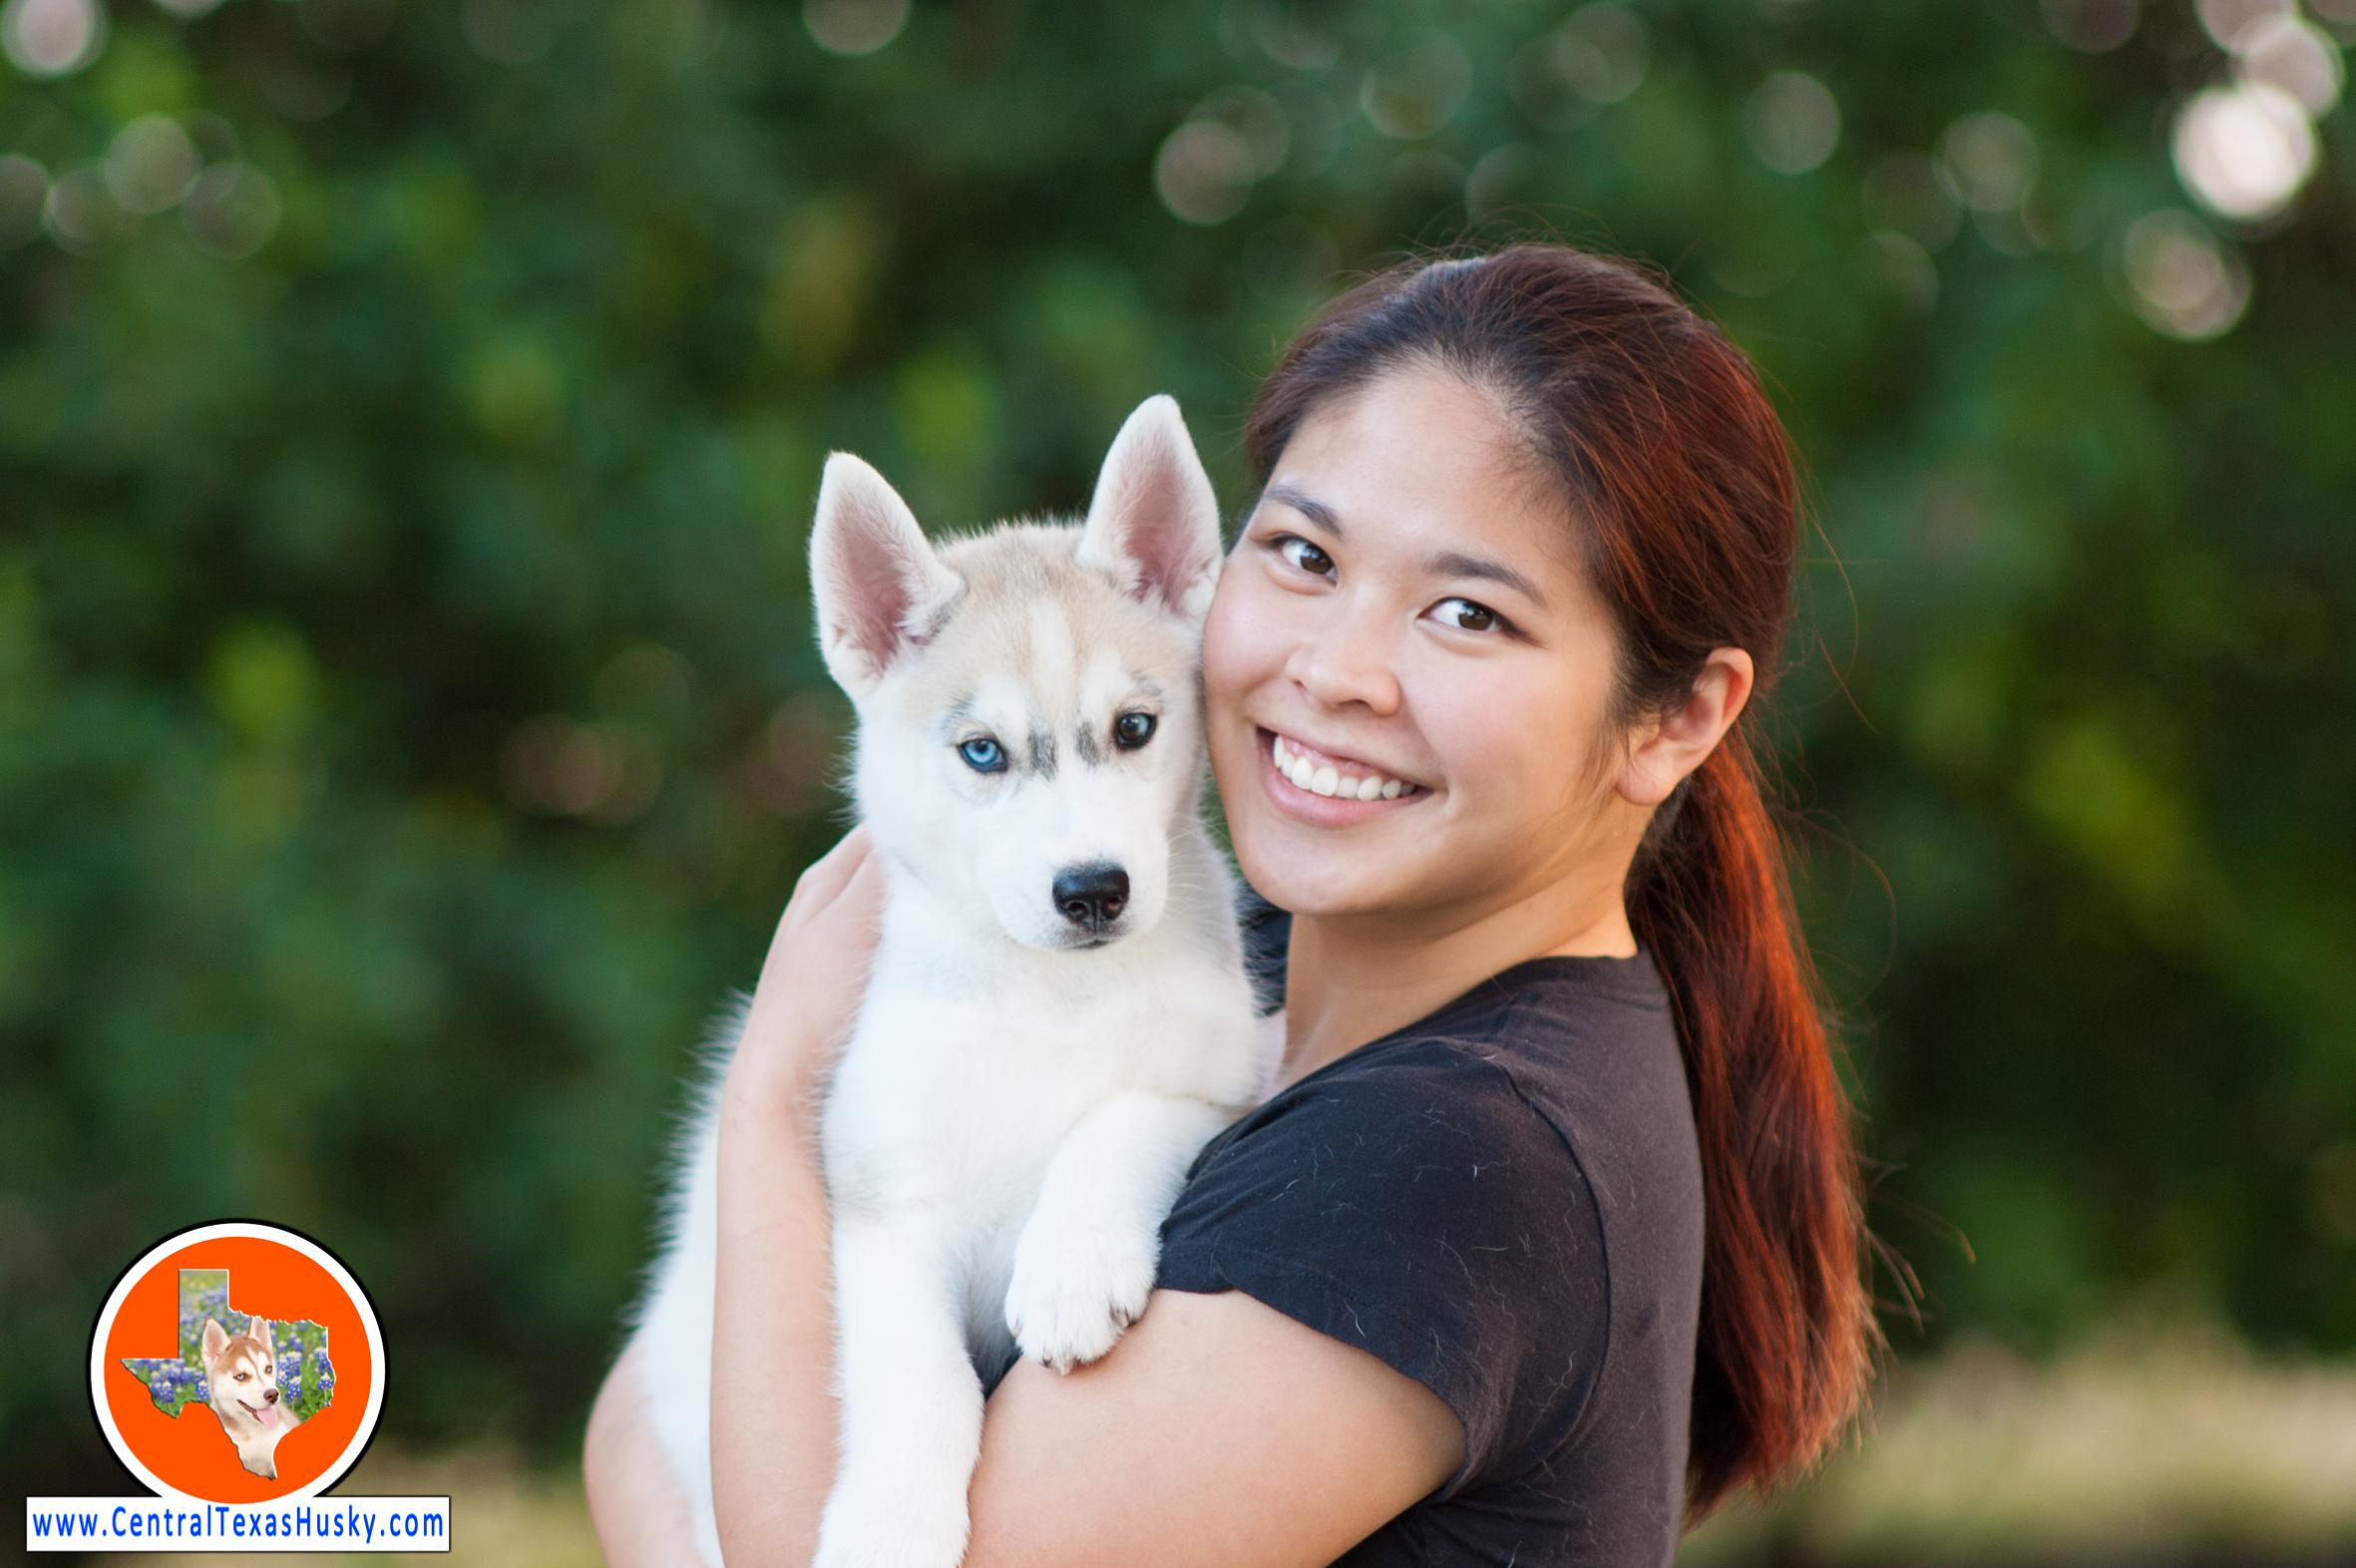 central-texas-husky_austin-siberian-husky-breeder_702632_20171104